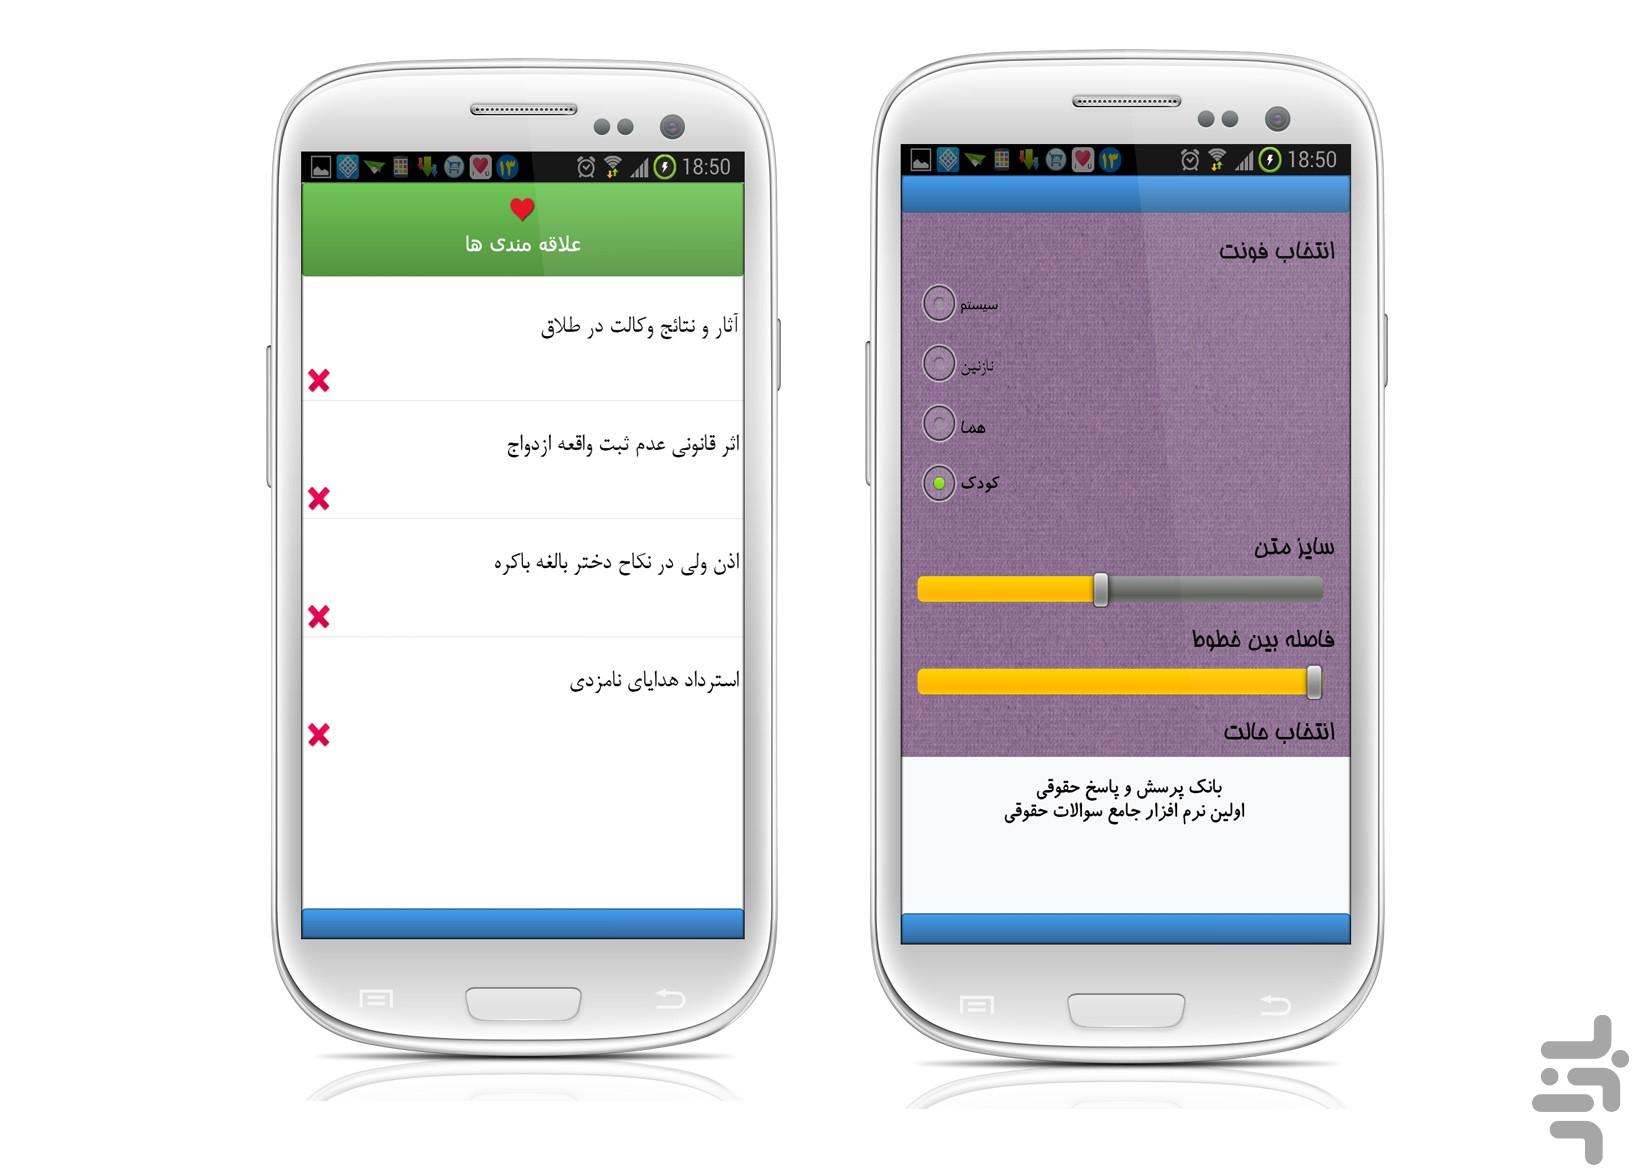 http://s.cafebazaar.ir/1/upload/screenshot/ir.Ghazi.parsababaei3.jpg